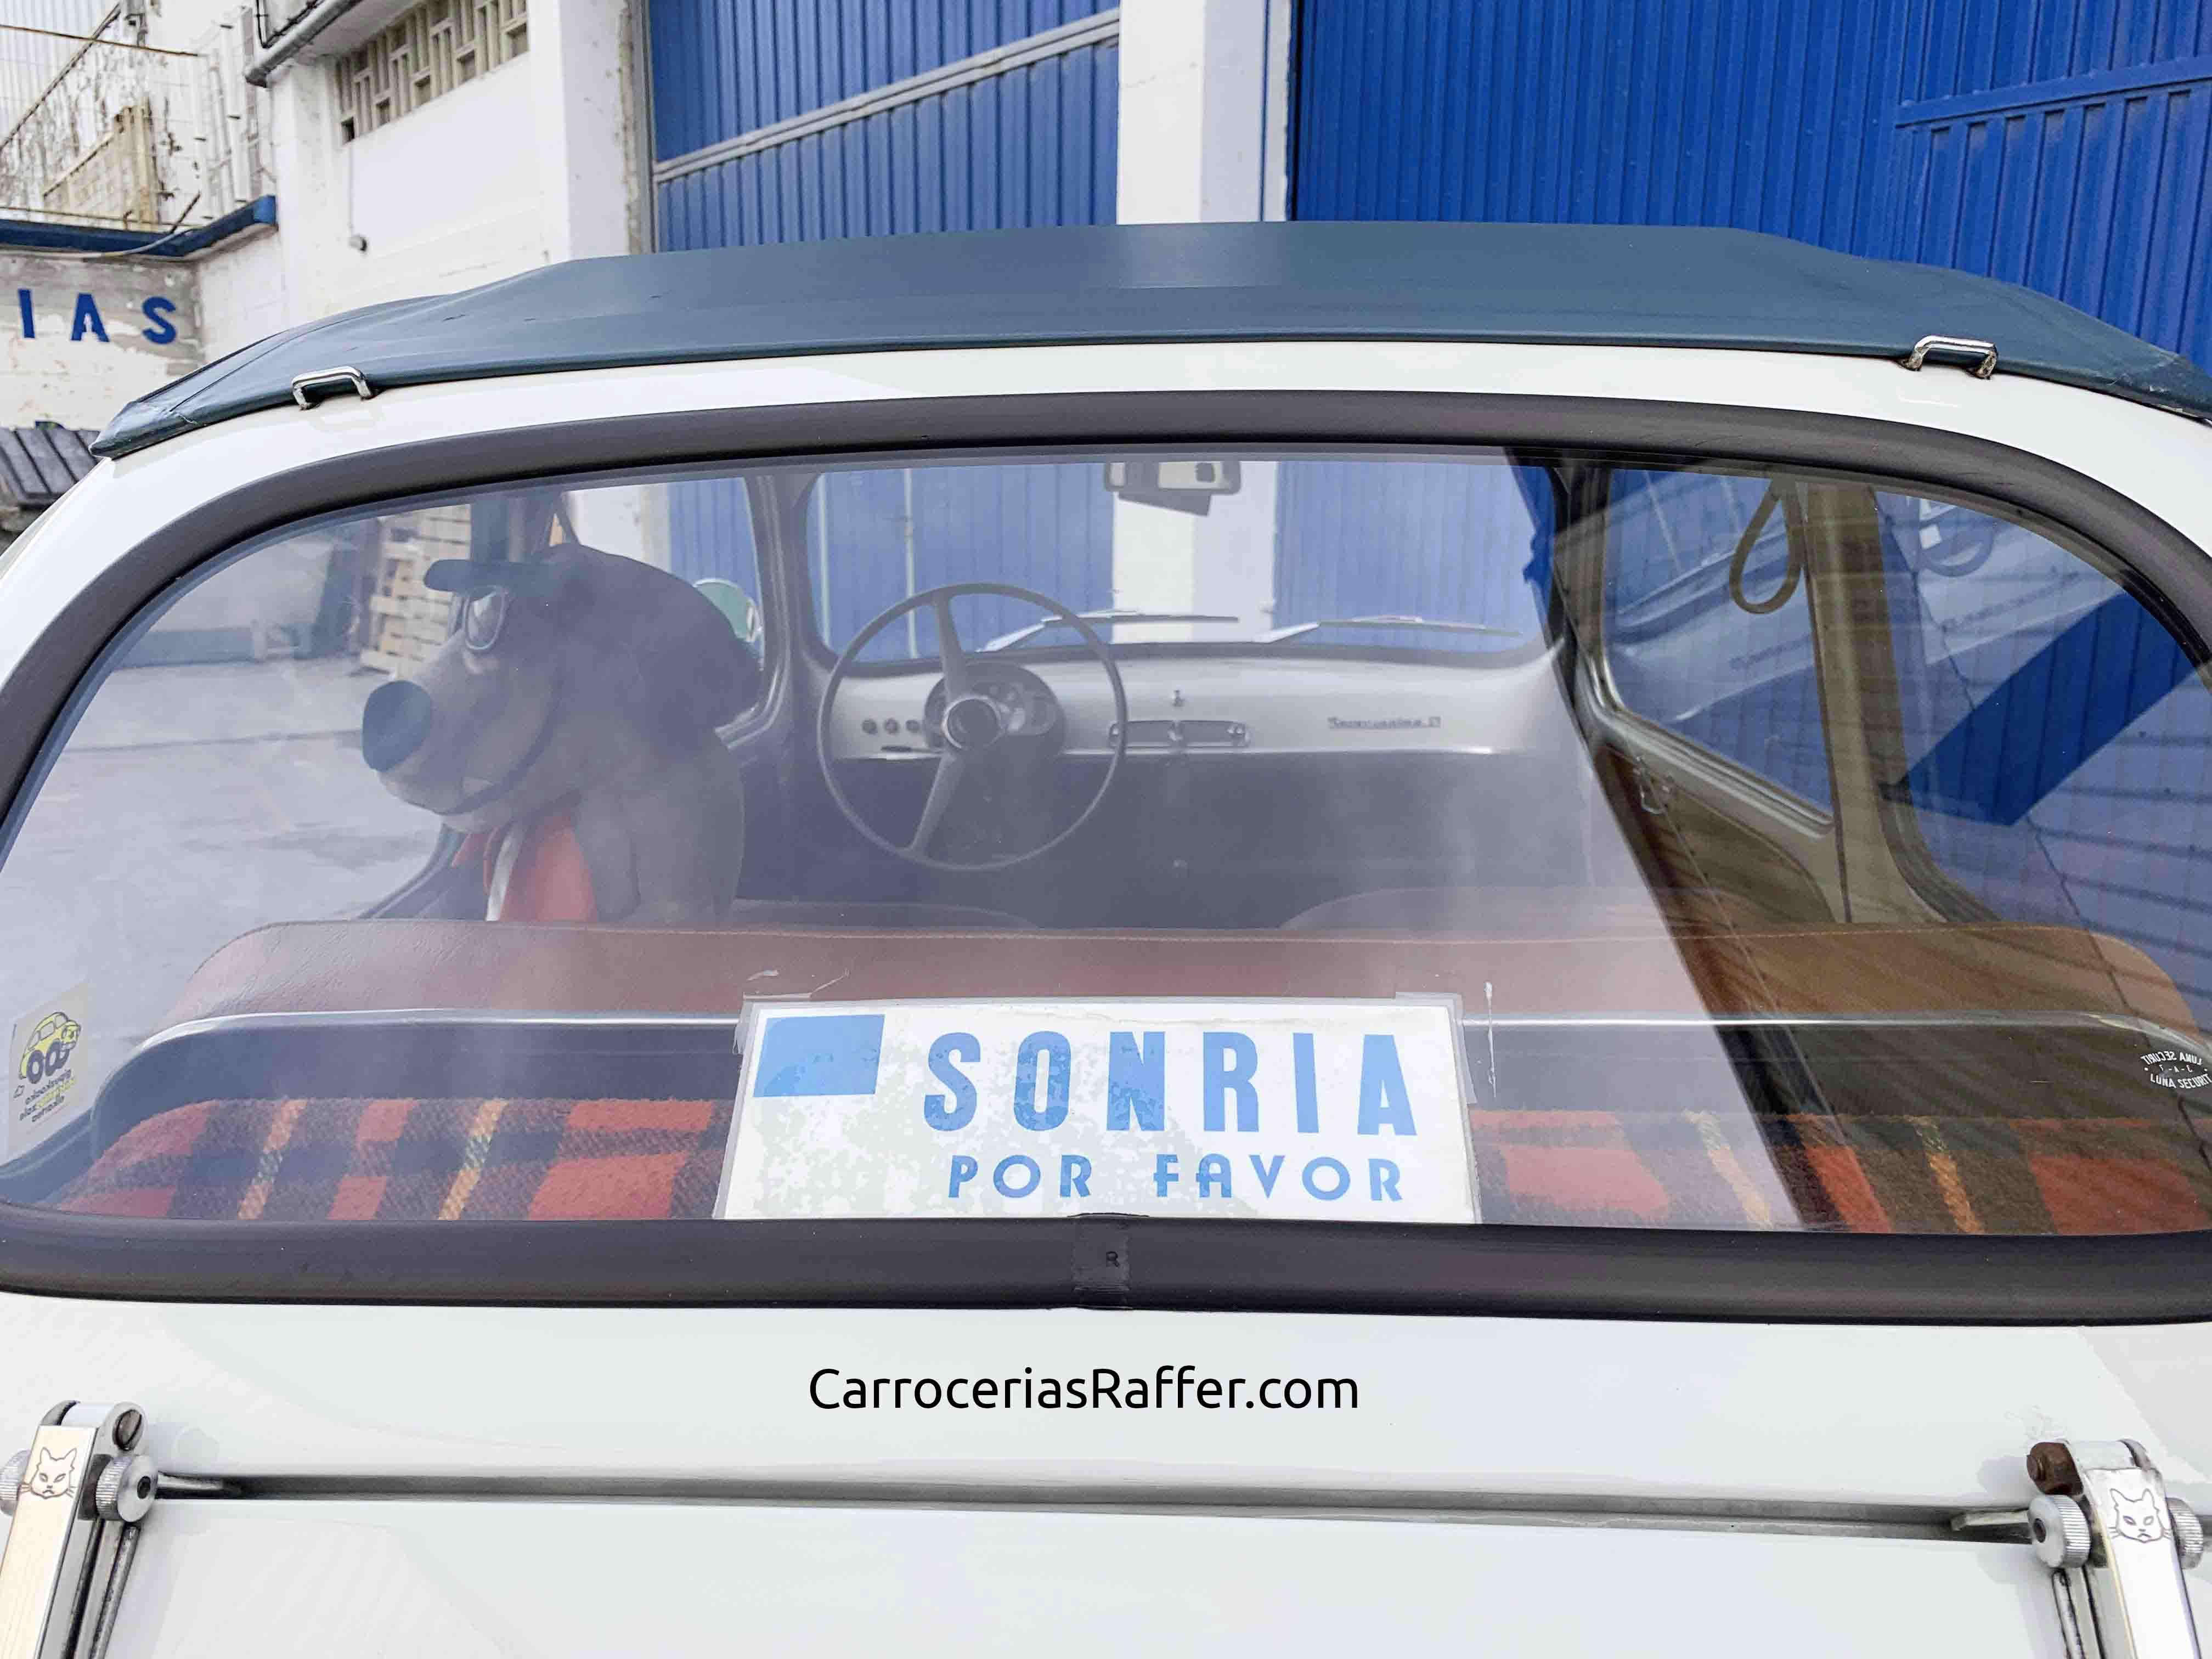 4 seat 600 descapotable carrocerias raffer hernani donostia